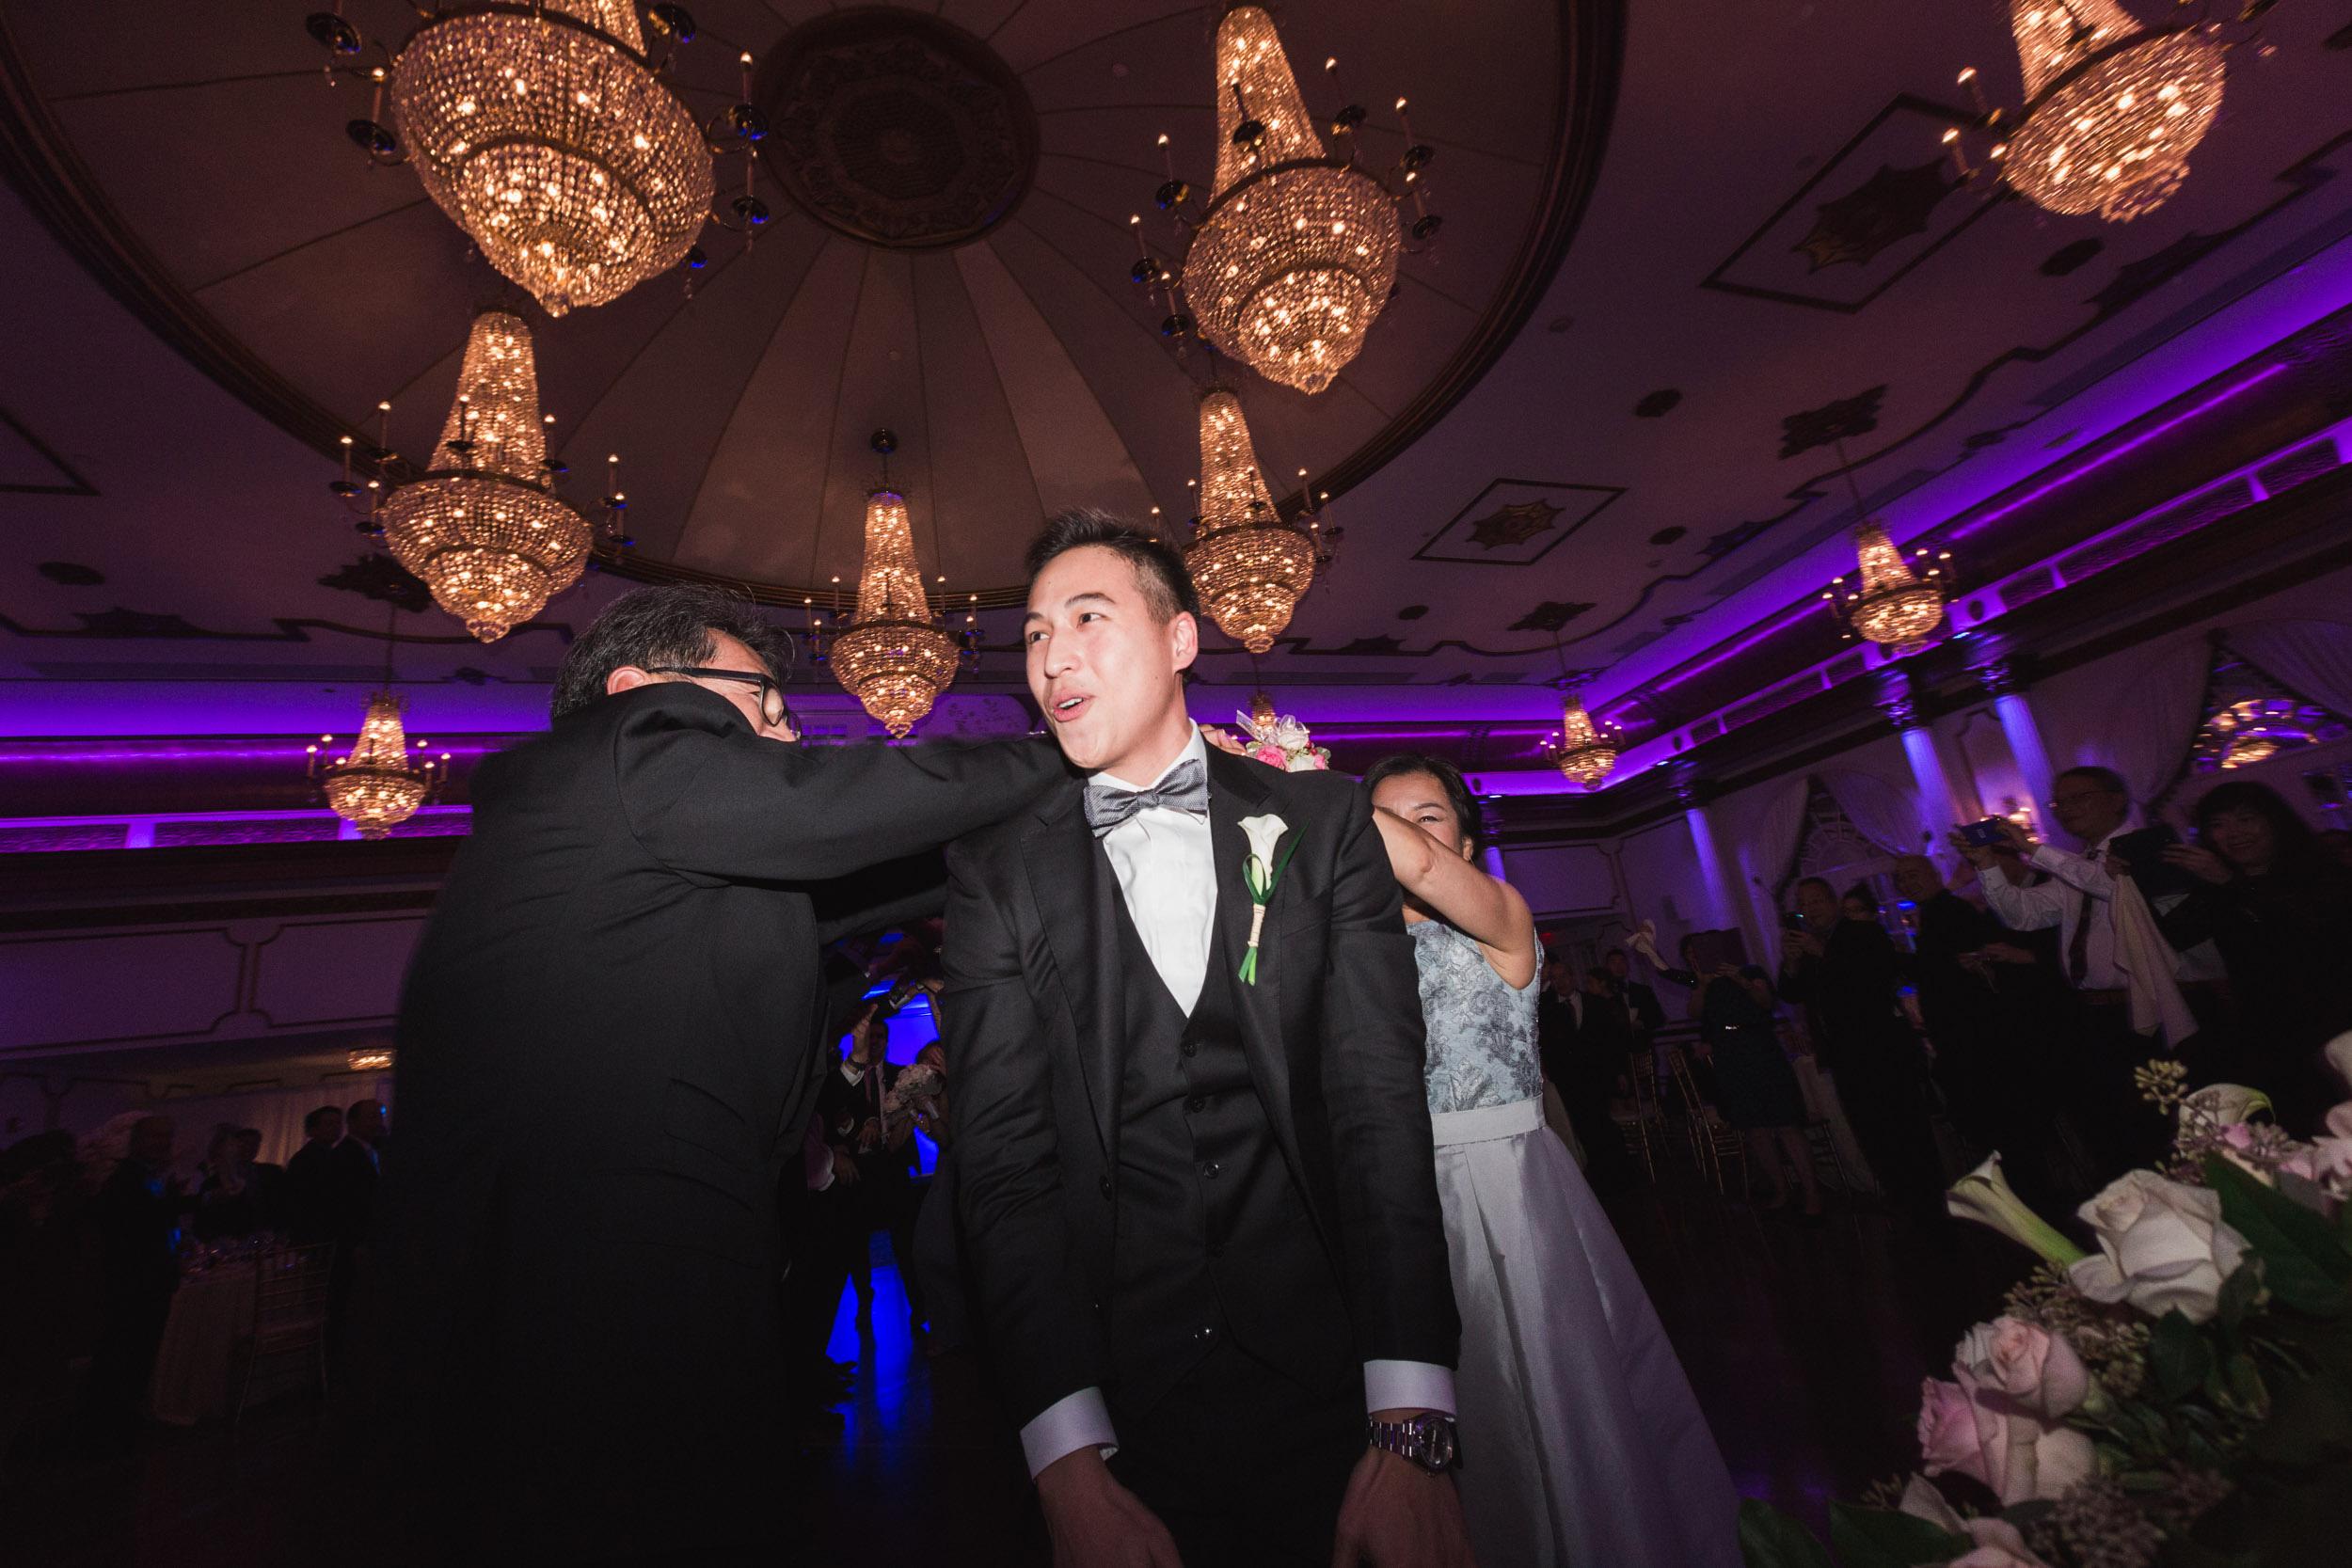 joyce-vincent-wedding-0021.jpg